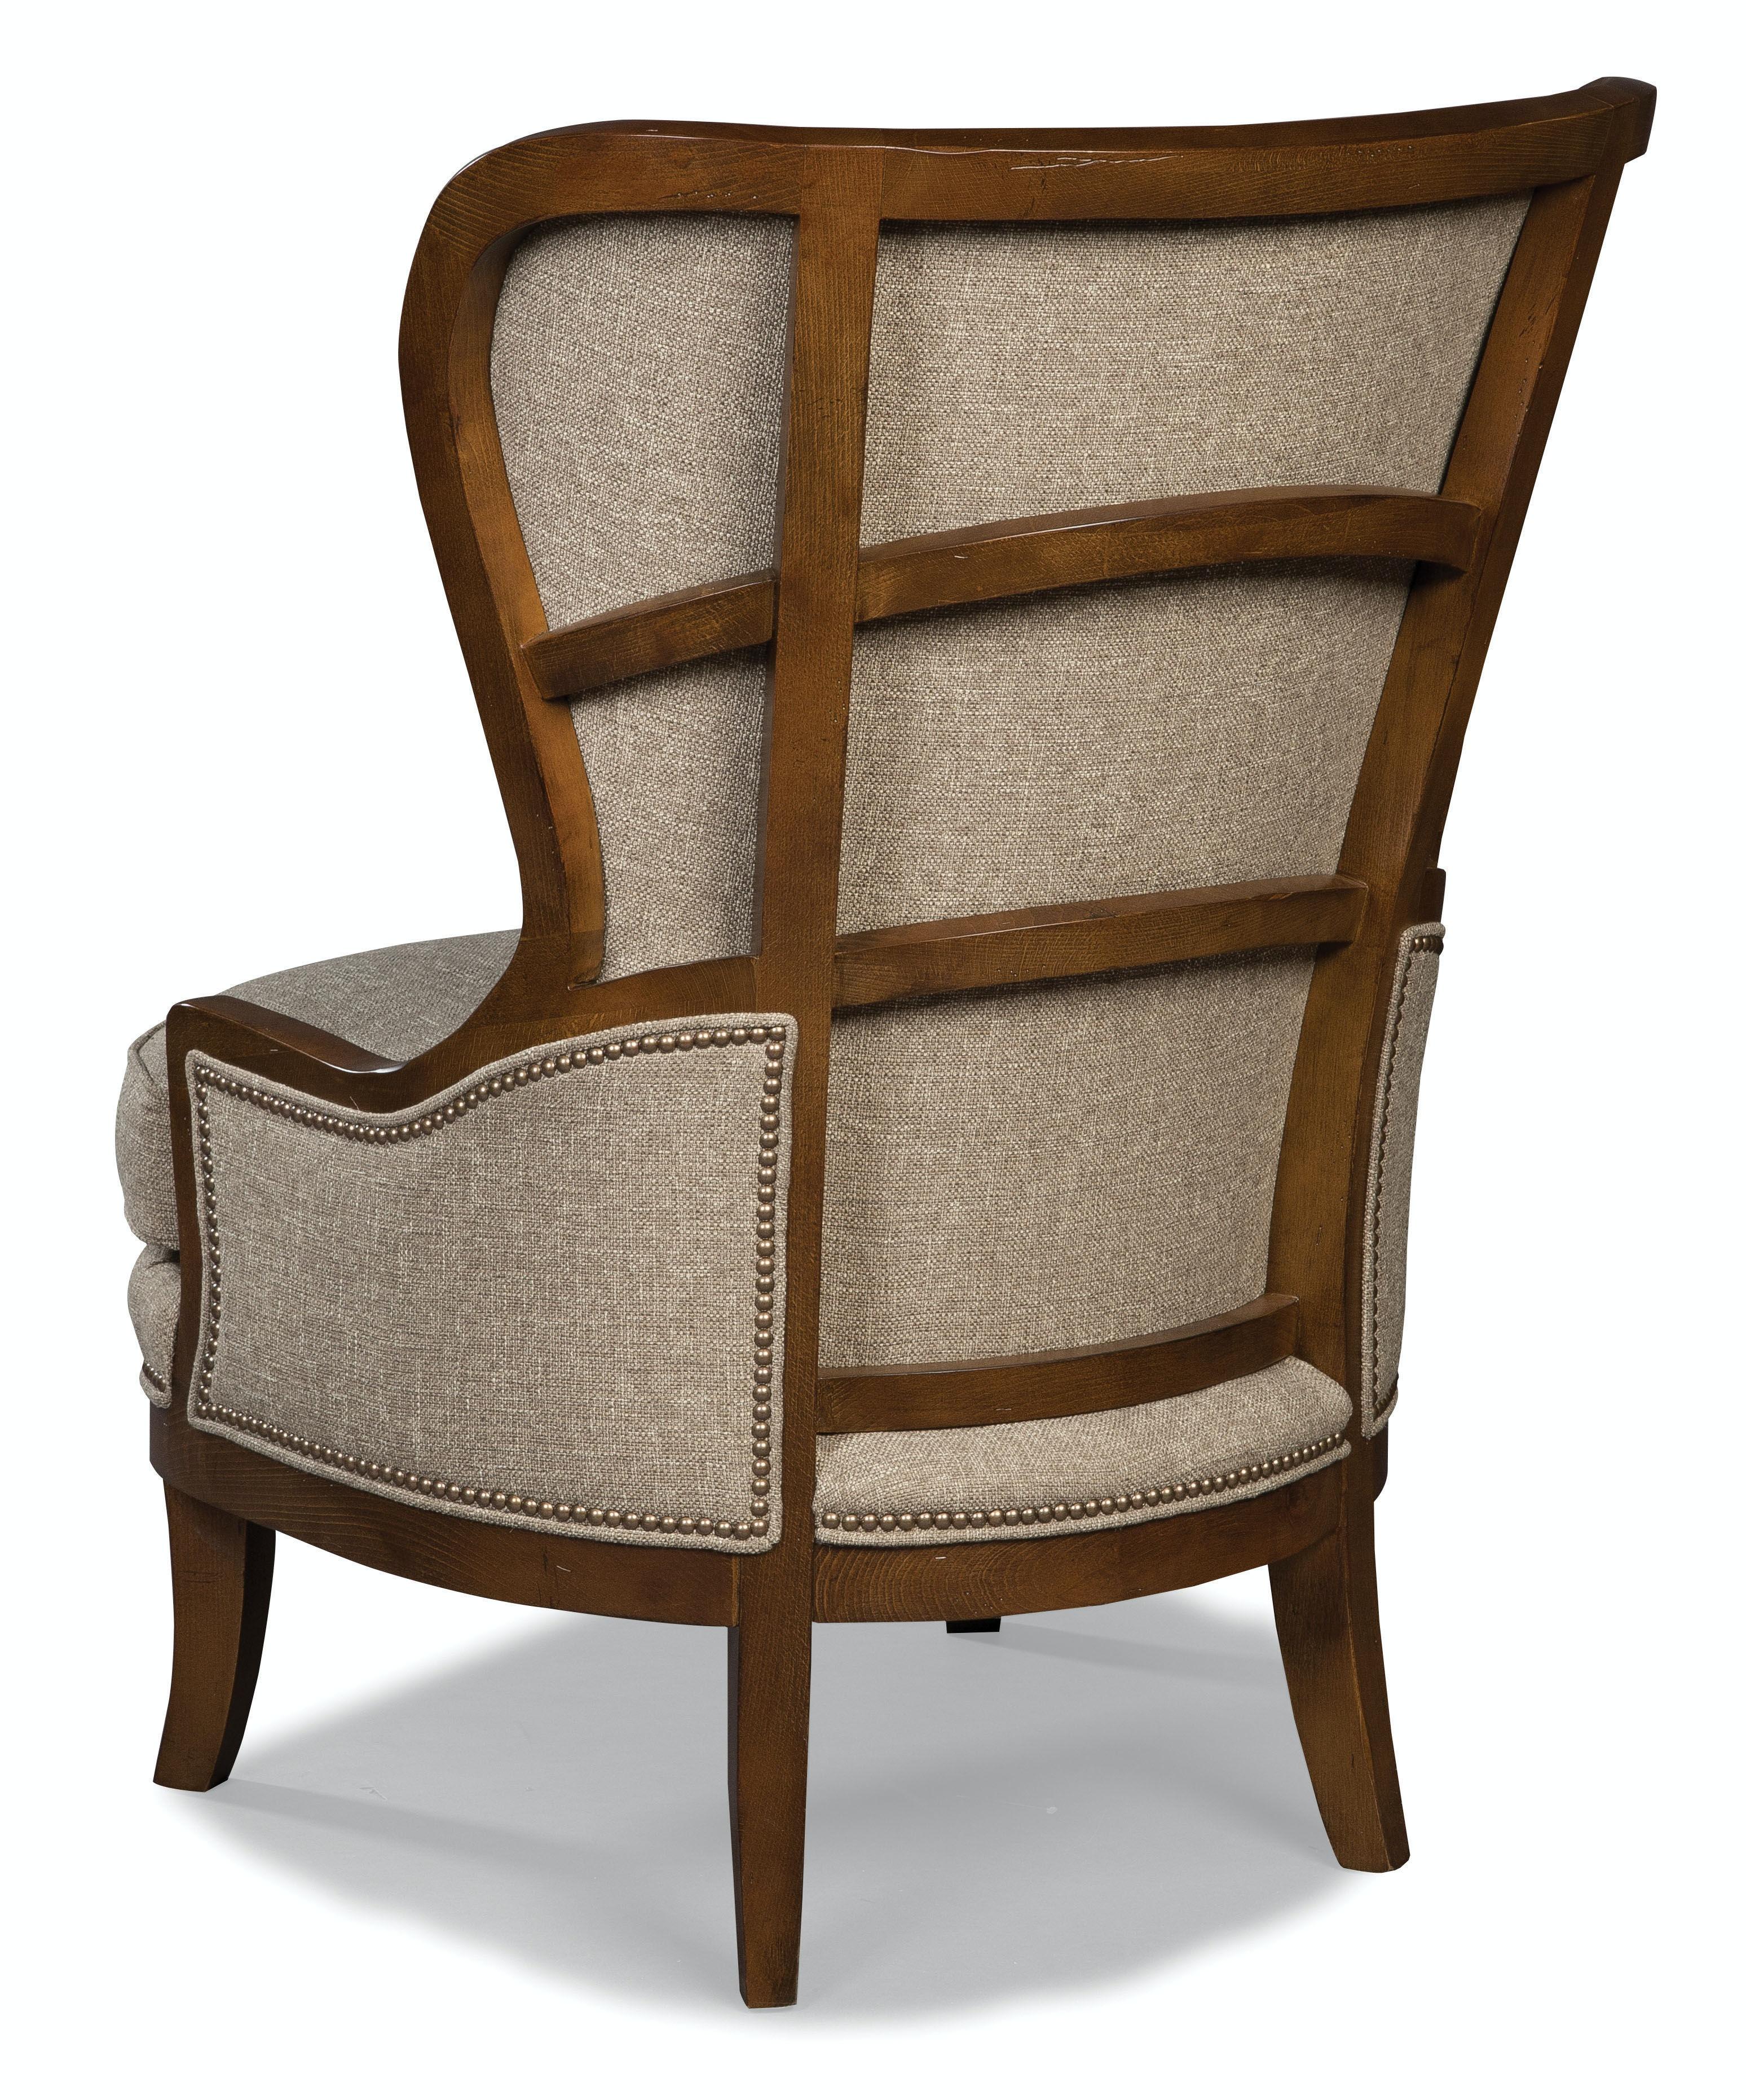 georgia chair company foam folding beds fairfield living room lawson wing 5192